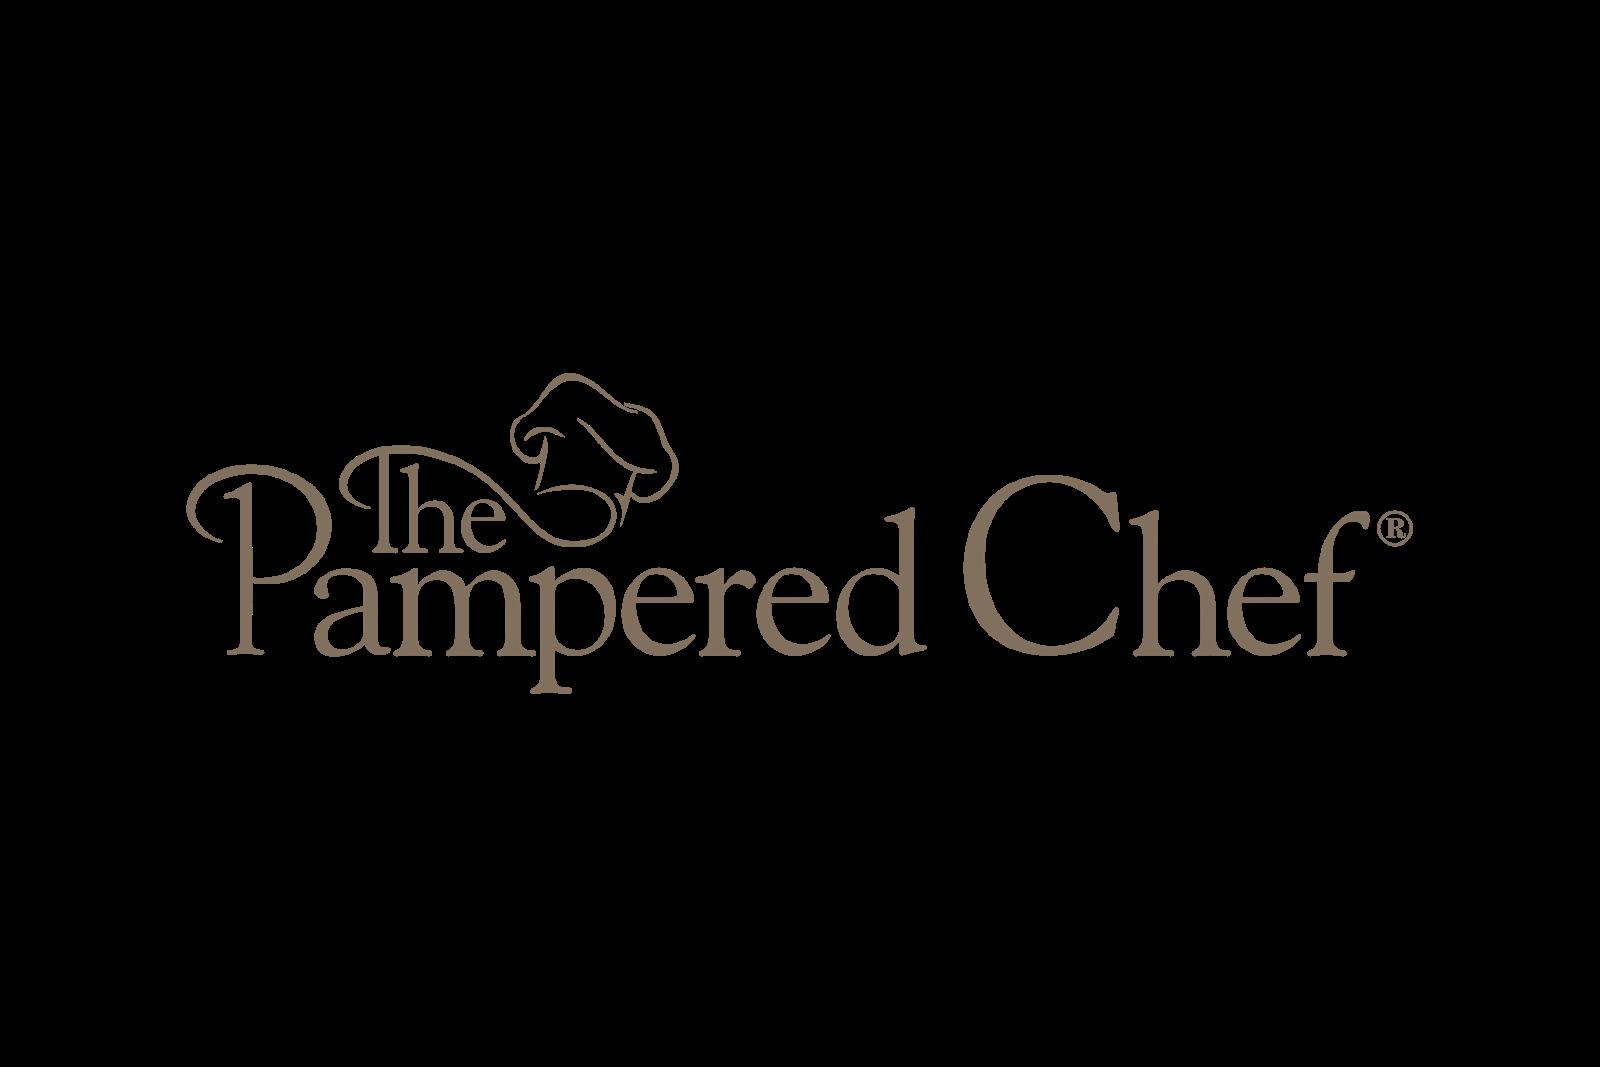 the pampered chef logo logo share rh logo share blogspot com pampered chef logo history pampered chef logo history